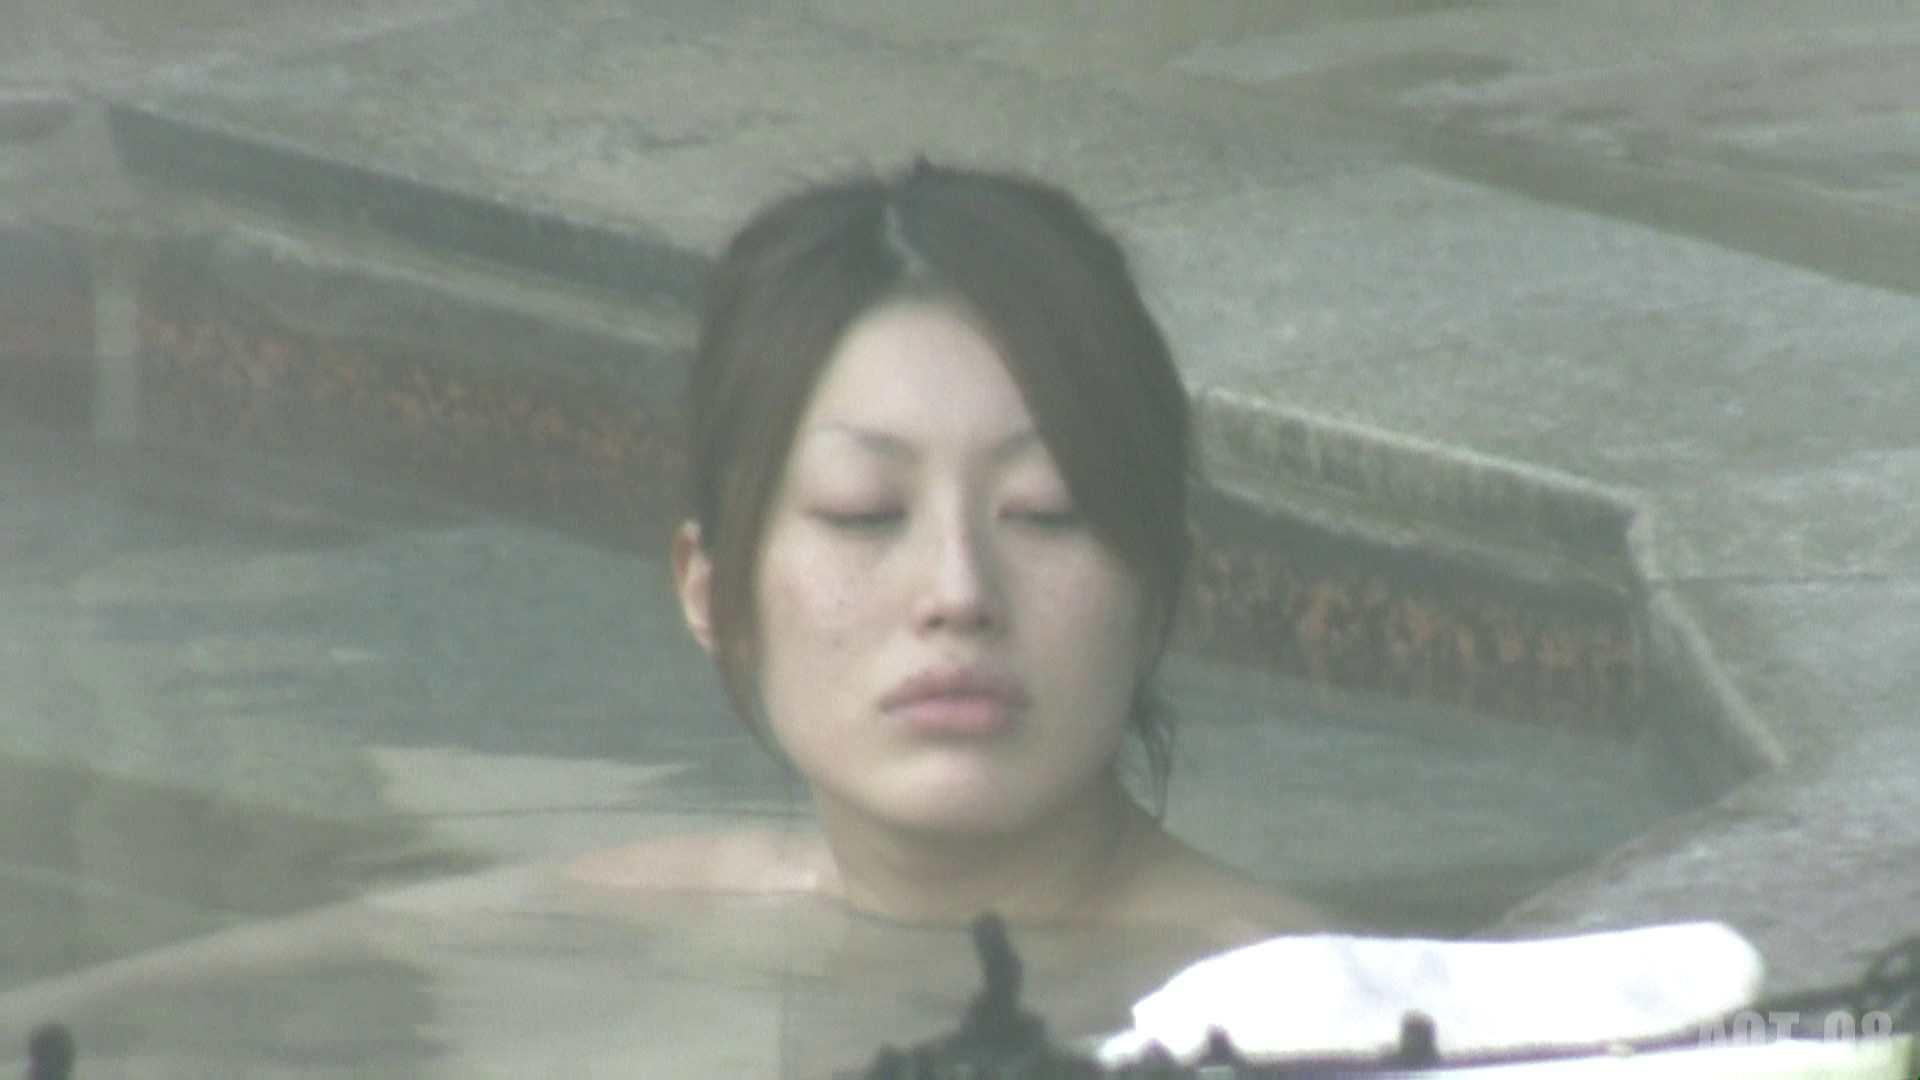 Aquaな露天風呂Vol.775 盗撮映像  74Pix 40